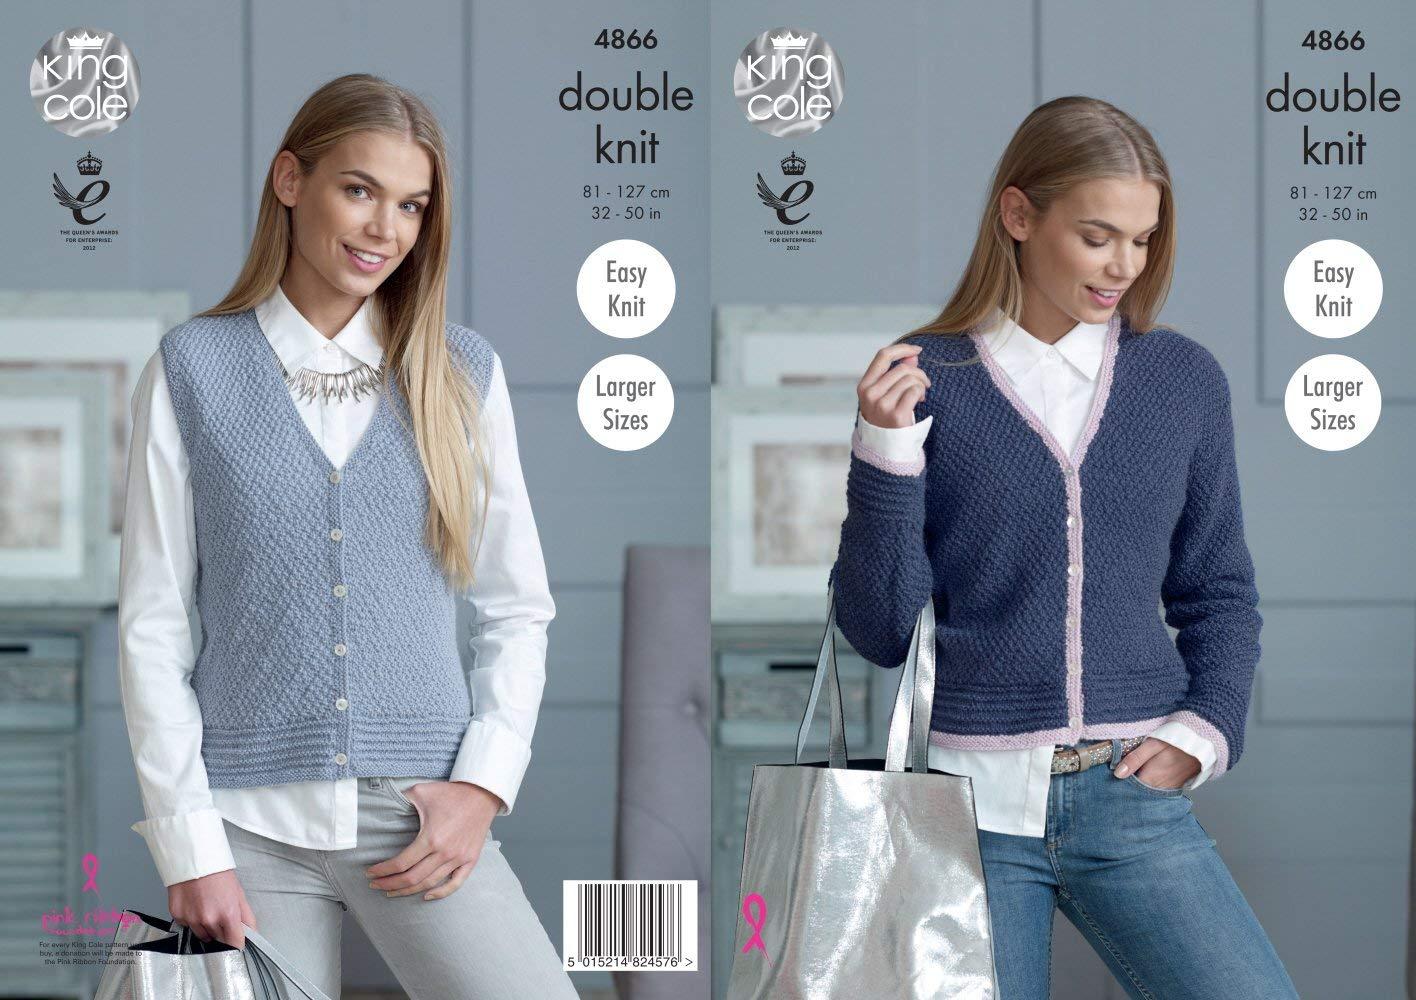 80643964c6d3f2 Get Quotations · King Cole Ladies Cardigan   Waistcoat Baby Alpaca Knitting  Pattern 4866 DK